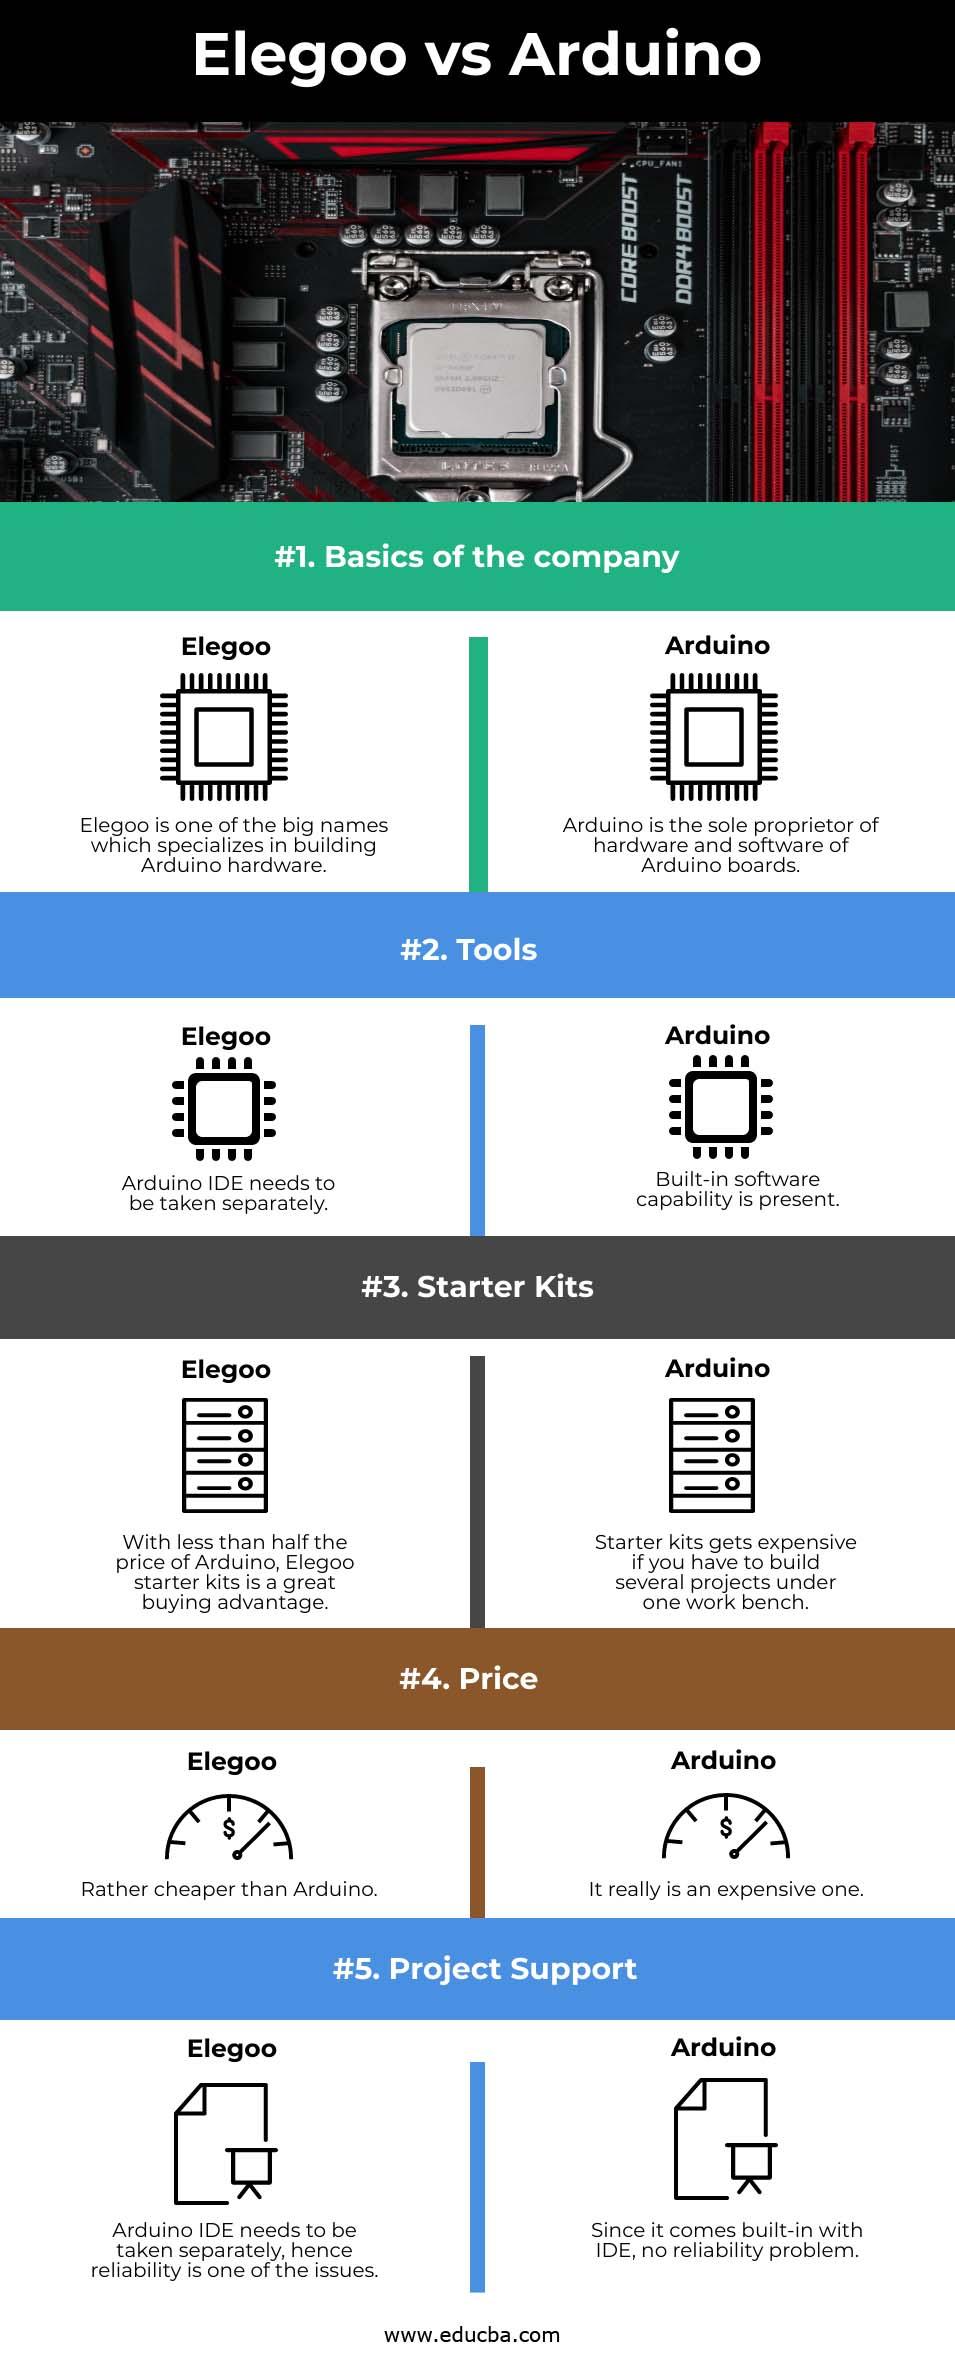 Elegoo vs Arduino info